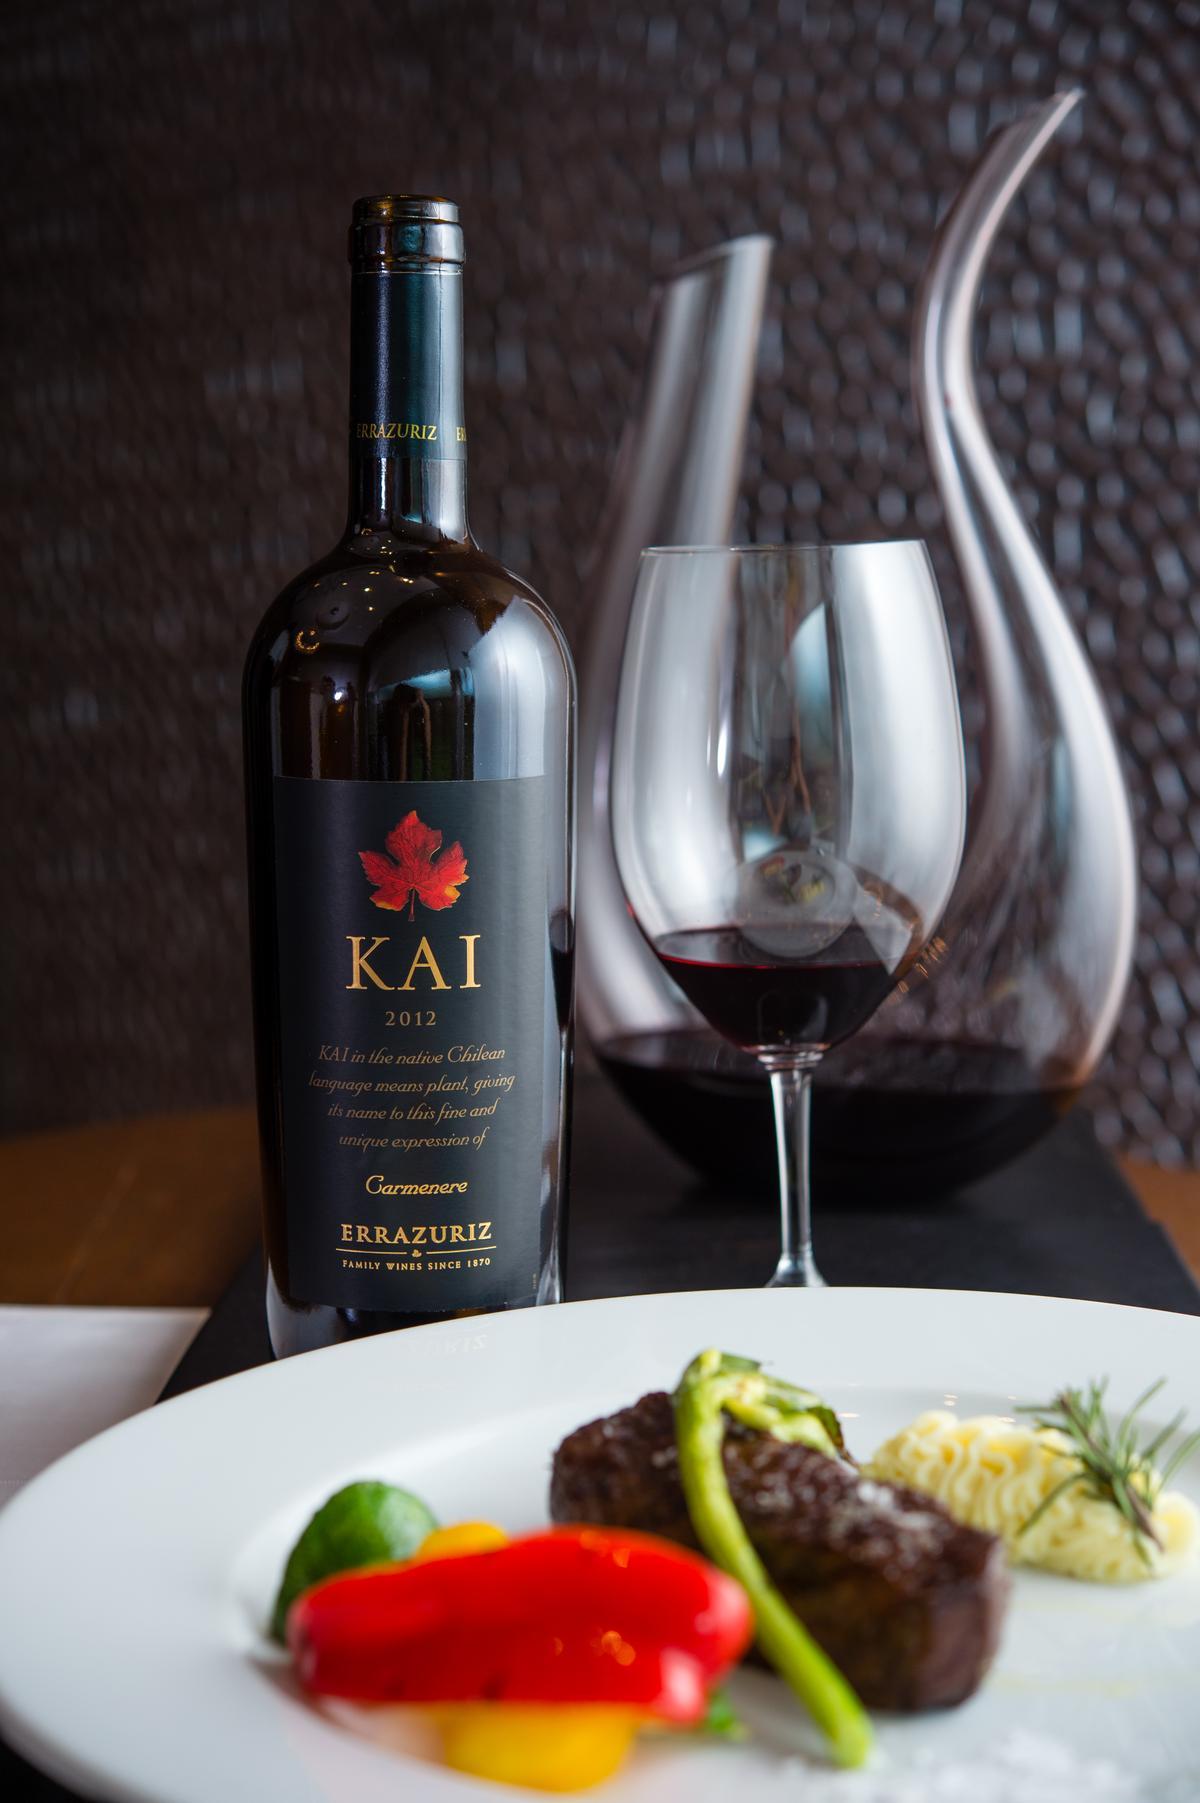 「Kai Carmenere極致精選卡米涅紅酒2012」是伊拉蘇酒廠的明星款,曾多次在盲評中擊敗法國名莊。誘人的胡椒辛香與鮮爽的果味,與紅肉的組合絕配。(7,400元/瓶)